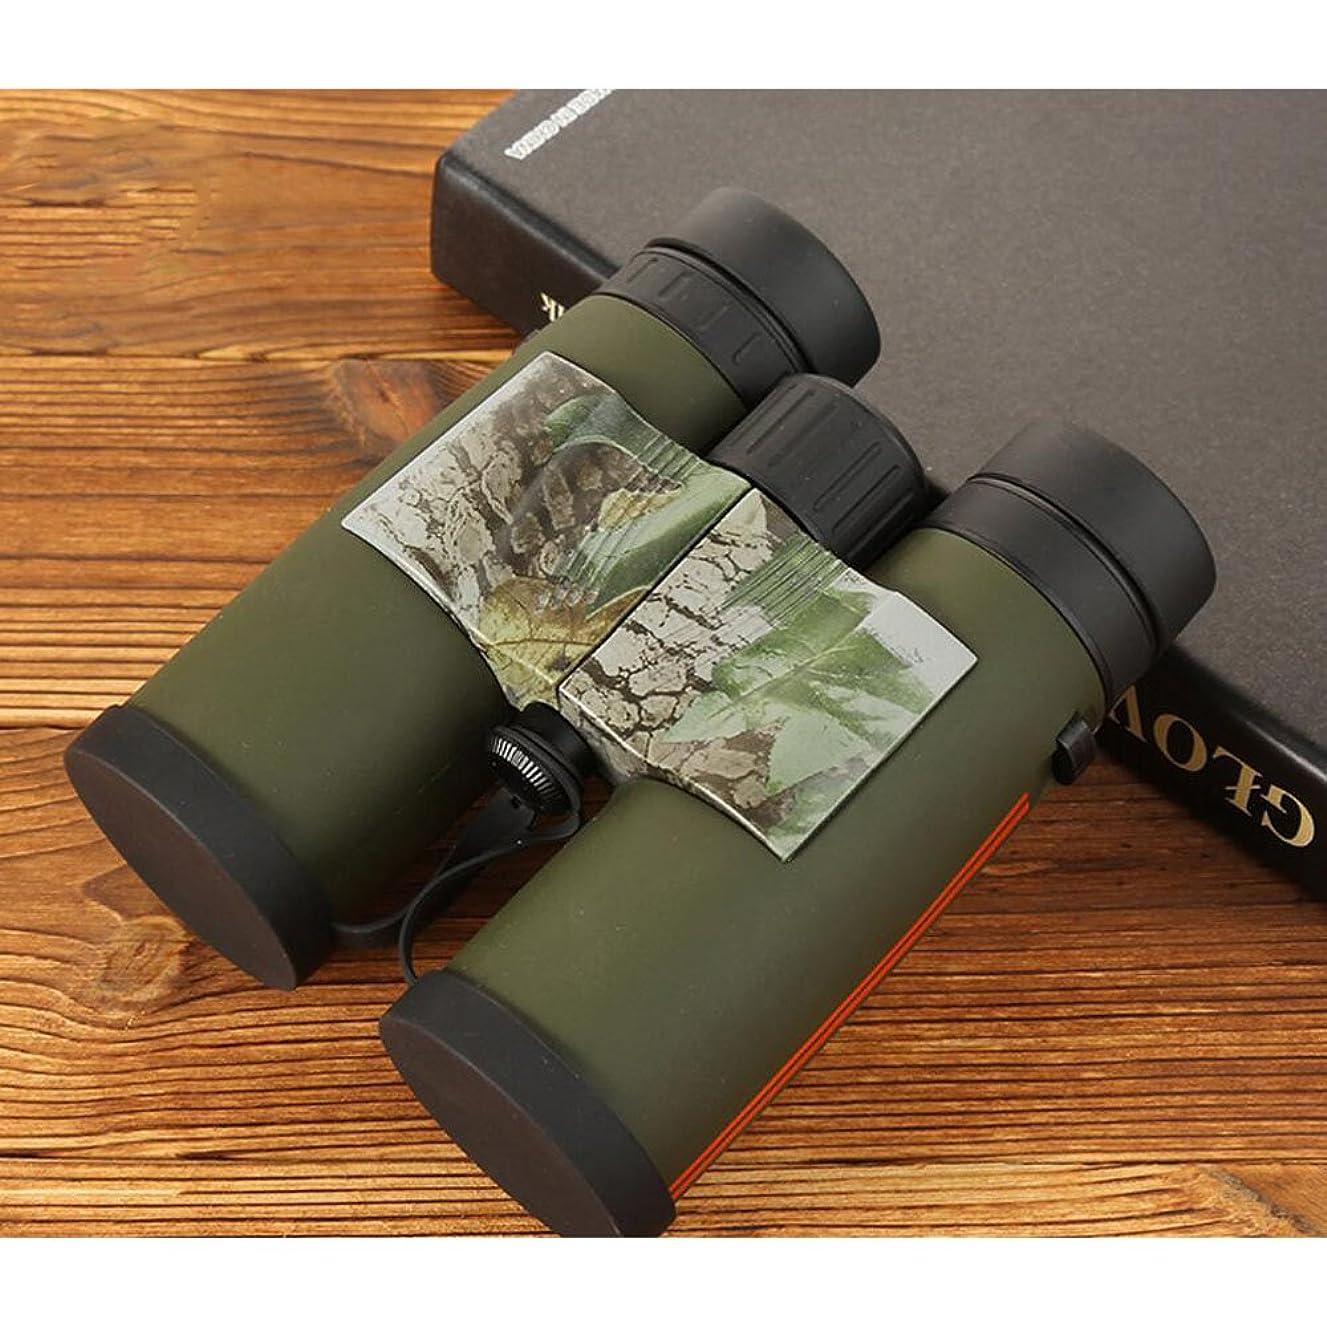 FLYSXP 8x42 Adult Binoculars, HD Compact Waterproof Anti-Fog Binoculars Bird Watching Hiking Concert Hunting Sport - BAK4 Prism FMC Lens Binoculars (Color : Green)